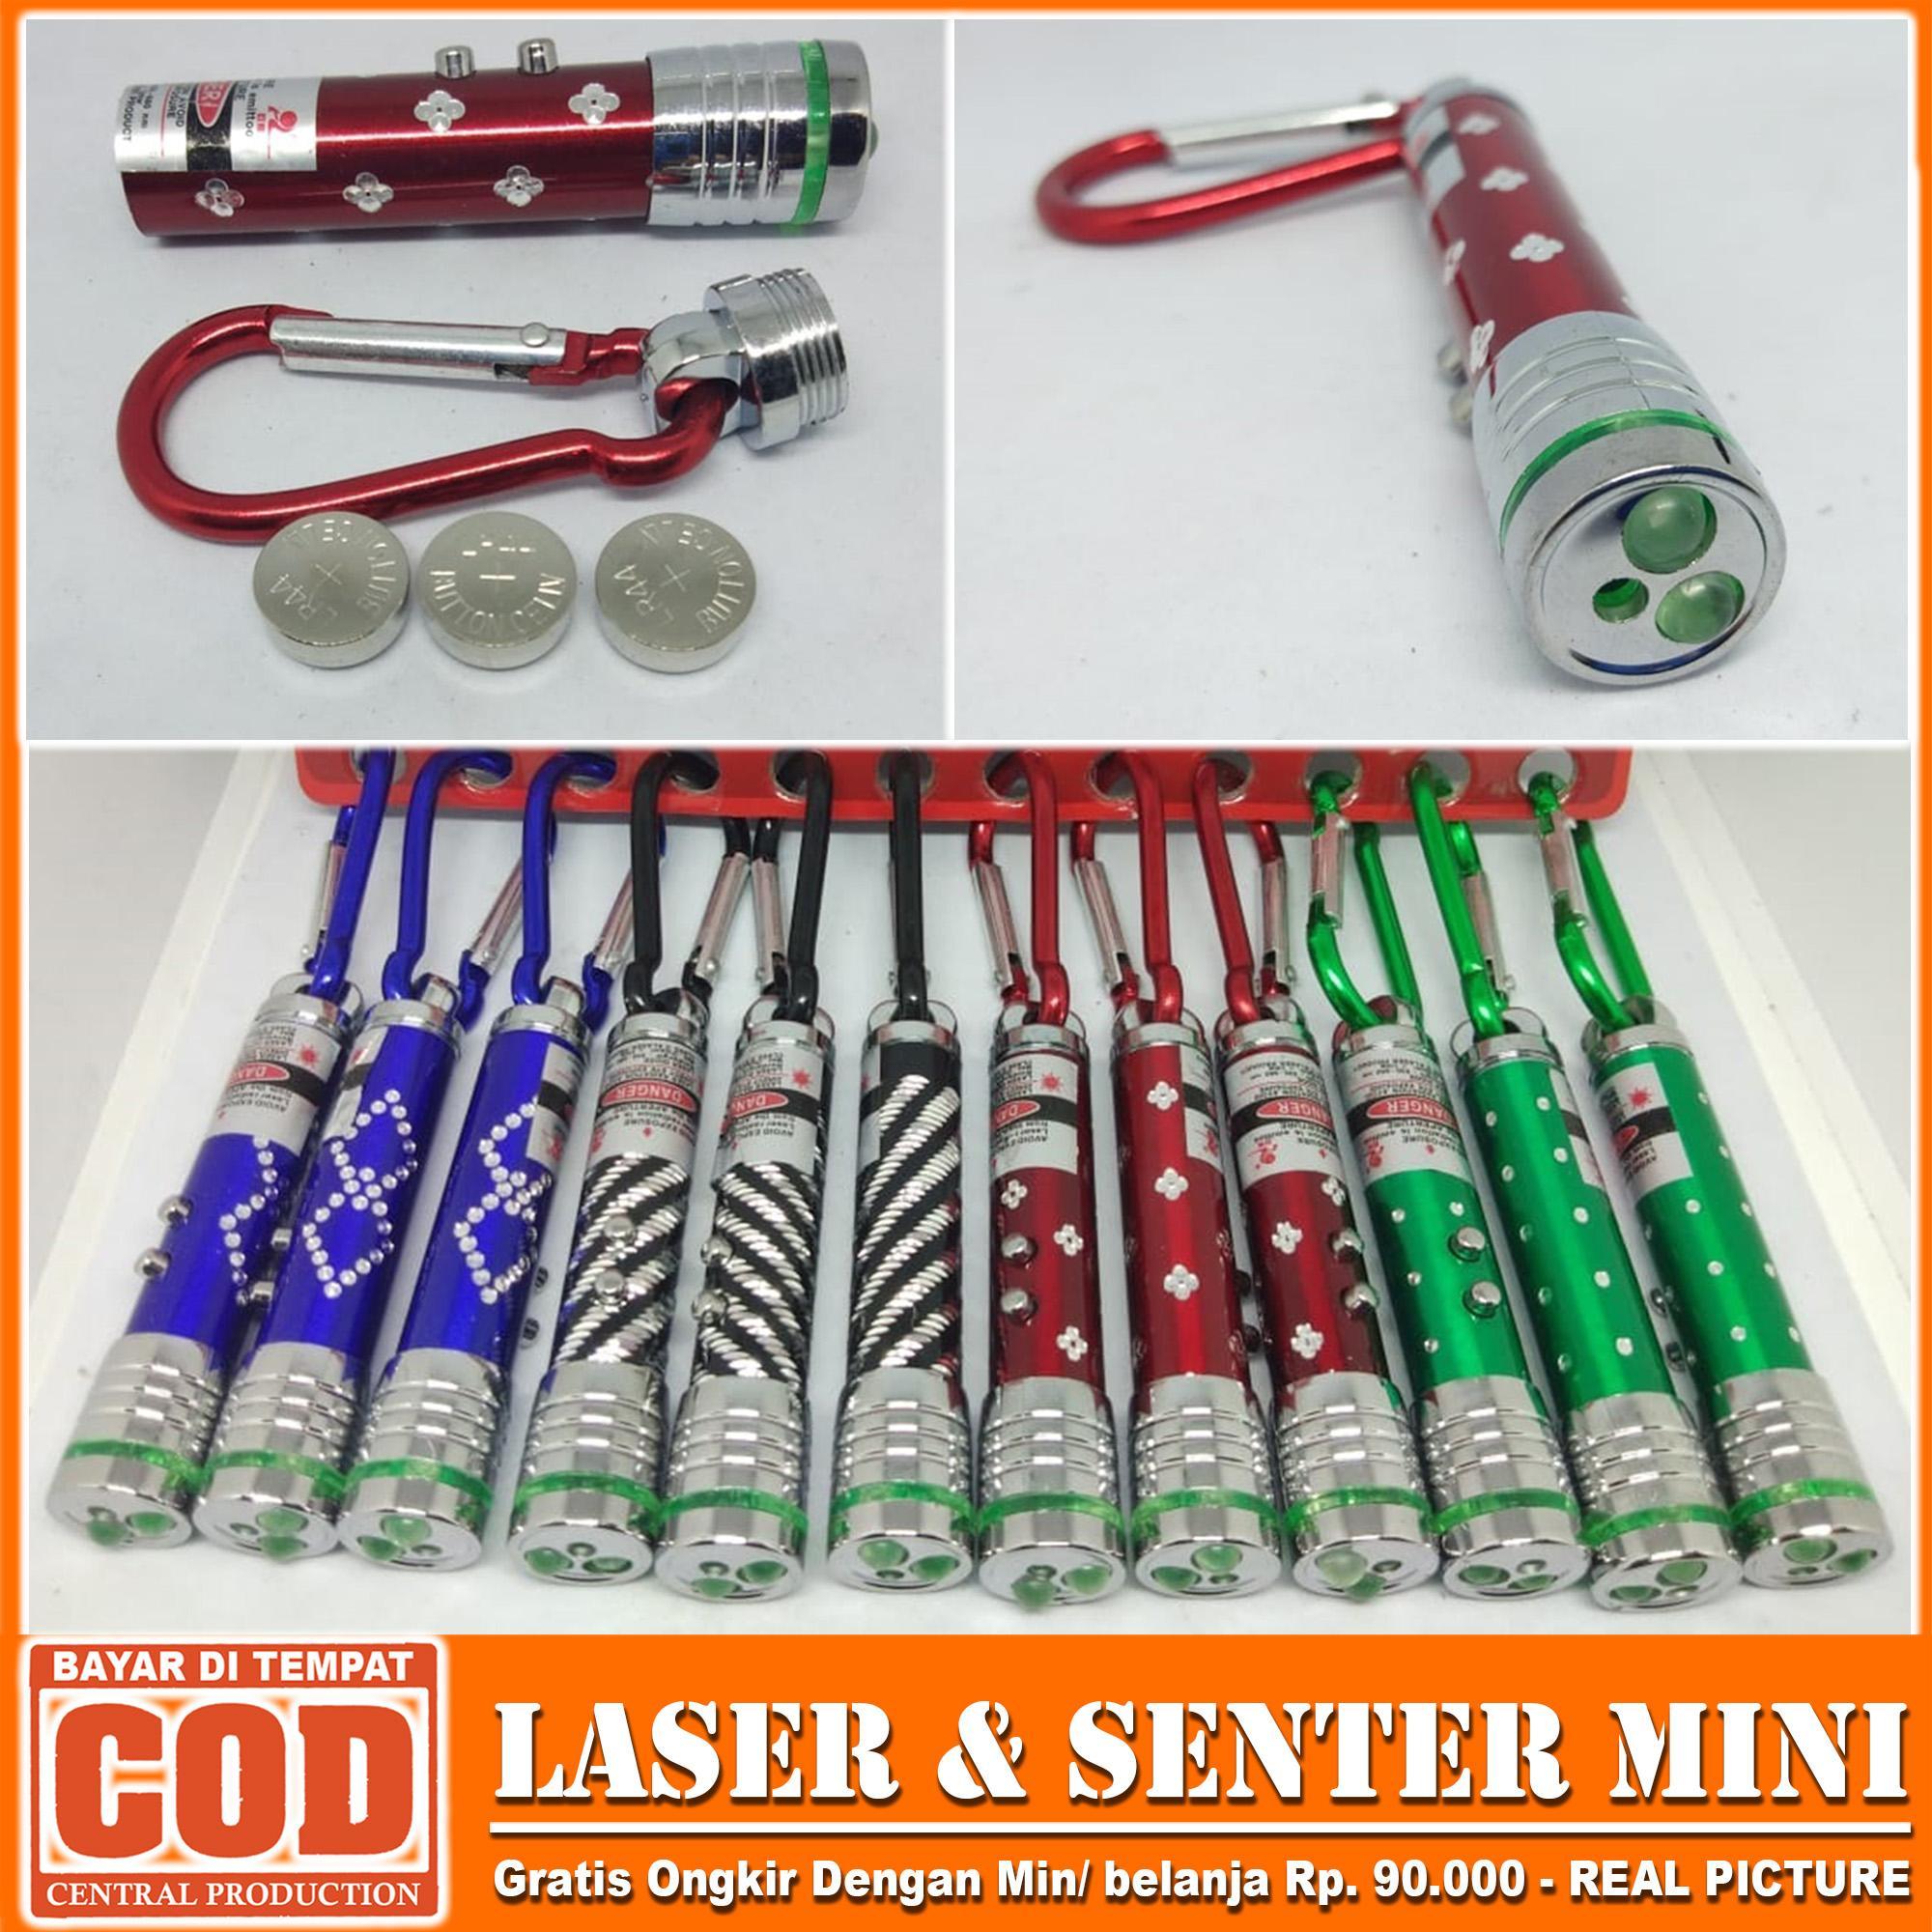 Buy Sell Cheapest Mitsuyama 3in1 Senter Best Quality Product Deals Raket Nyamuk 3 In 1 Stark Stk 002 Laser Mini 12pcs Satu Lusin Klap Klip Cocok